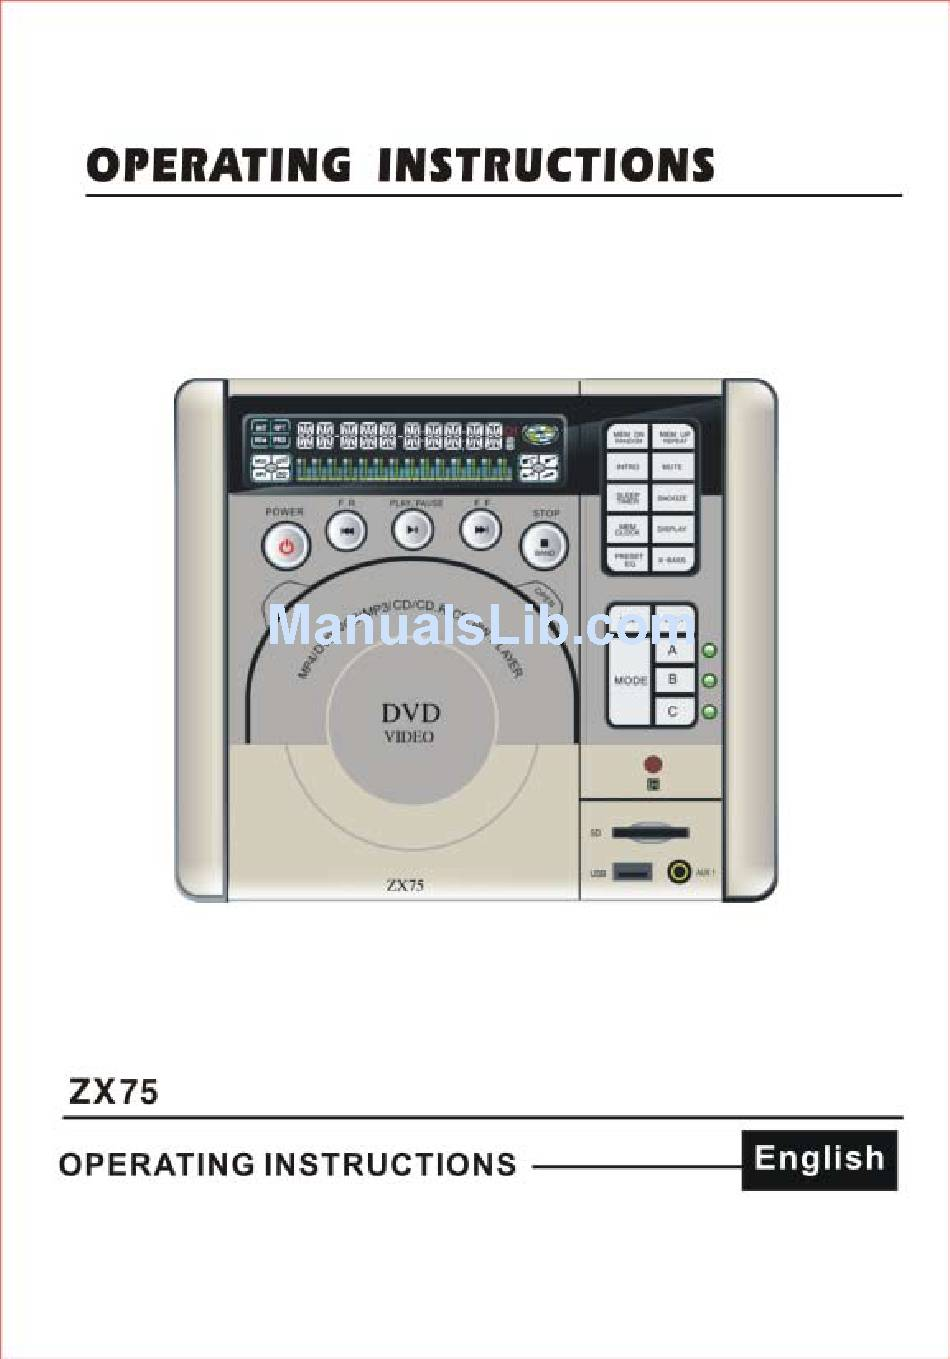 CONCERTONE ZX75 OPERATING INSTRUCTIONS MANUAL Pdf Download | ManualsLibManualsLib